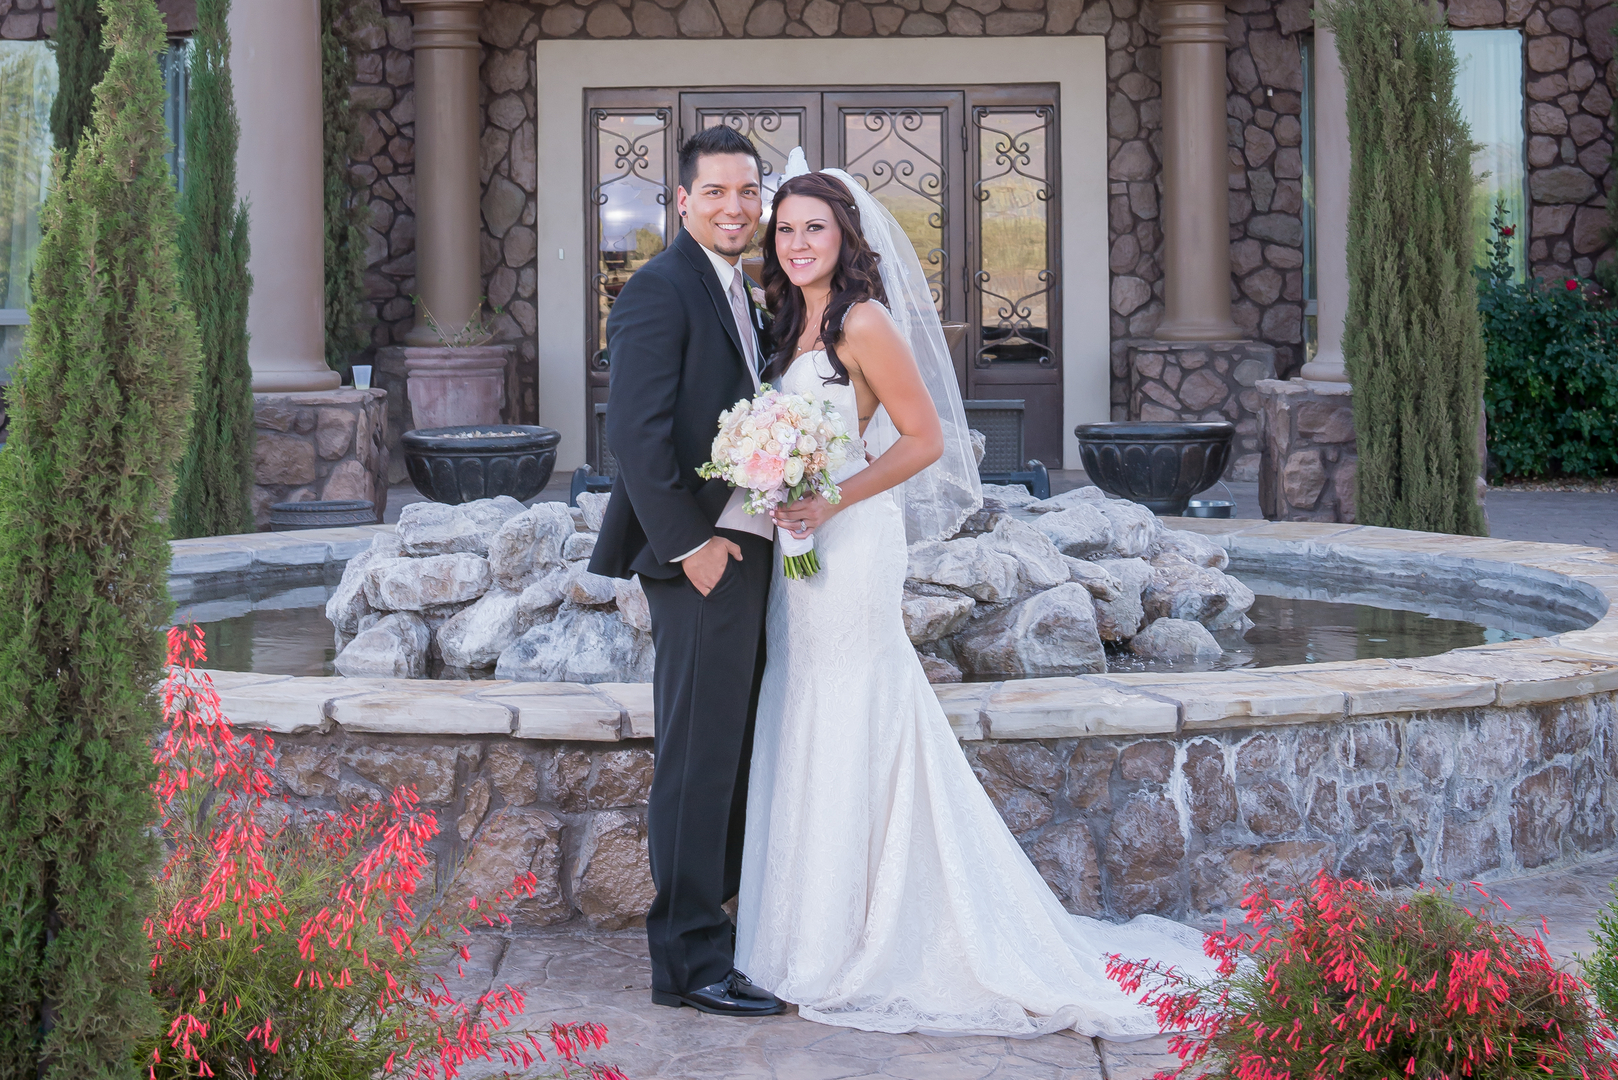 superstition manor wedding and event center wedding reception